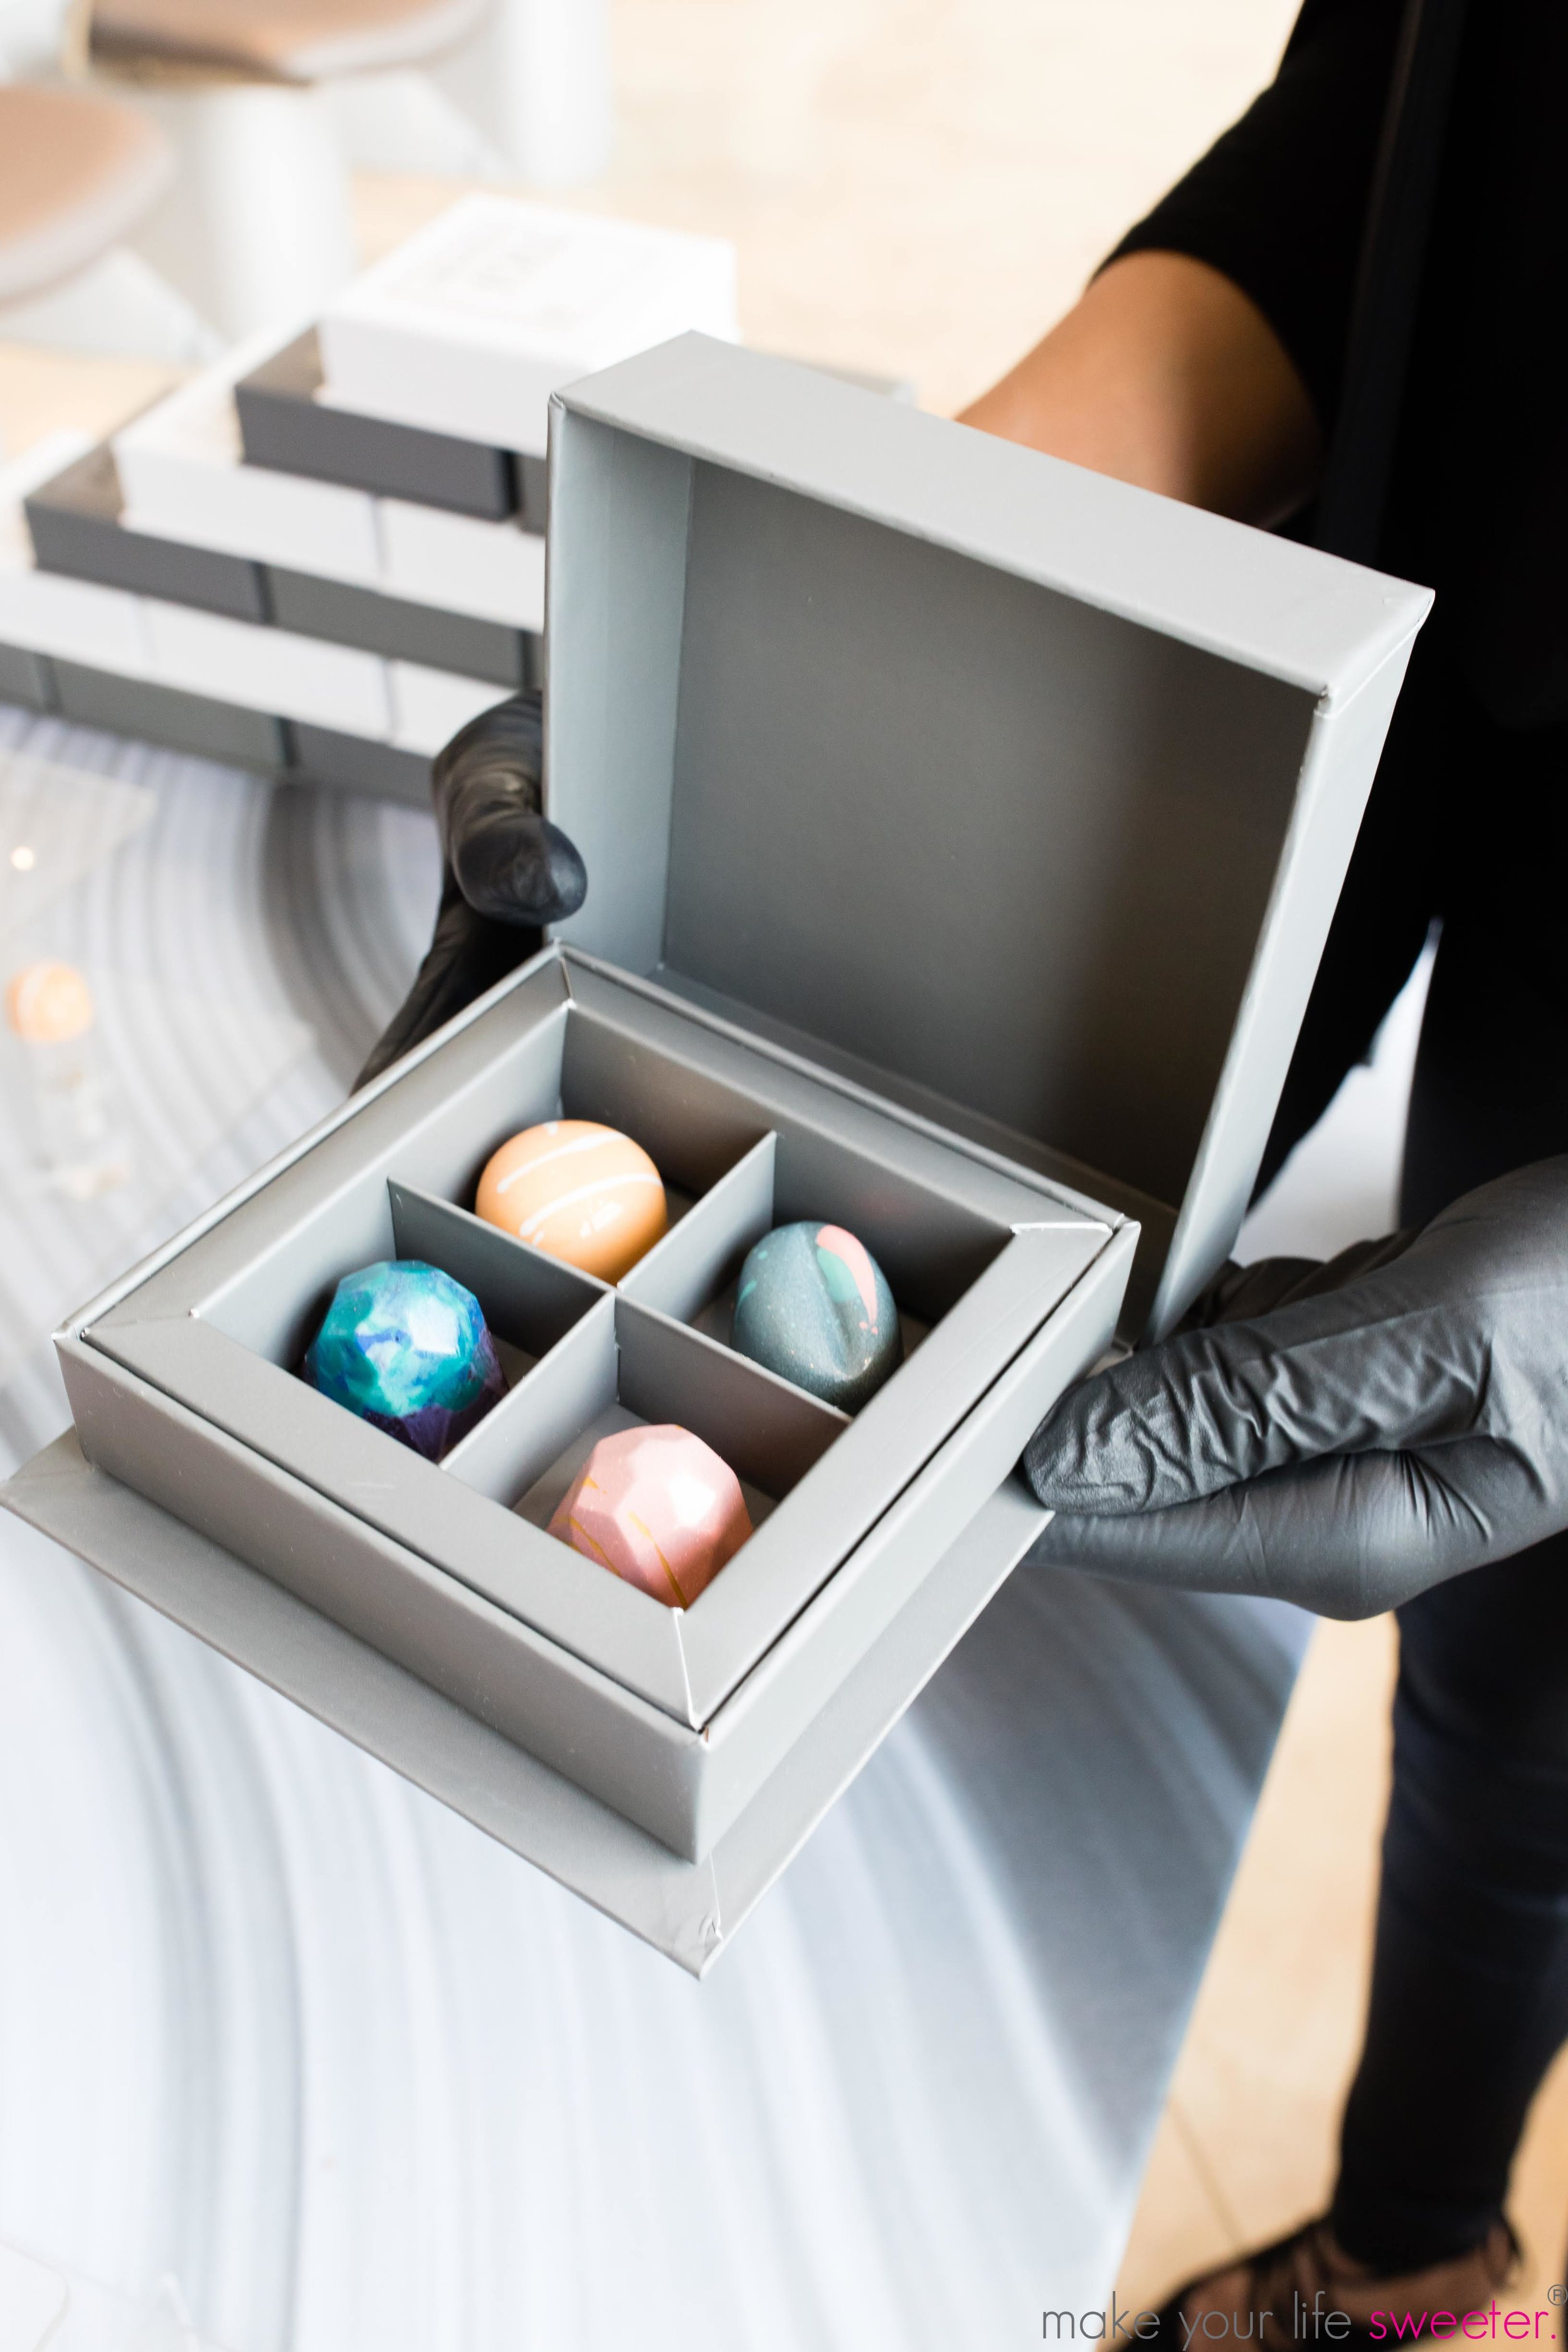 Make Your Life Sweeter Events - TIGI Fuga Centro Grand Opening - Artisanal Truffle Bar with customized TIGI Takeaway boxes